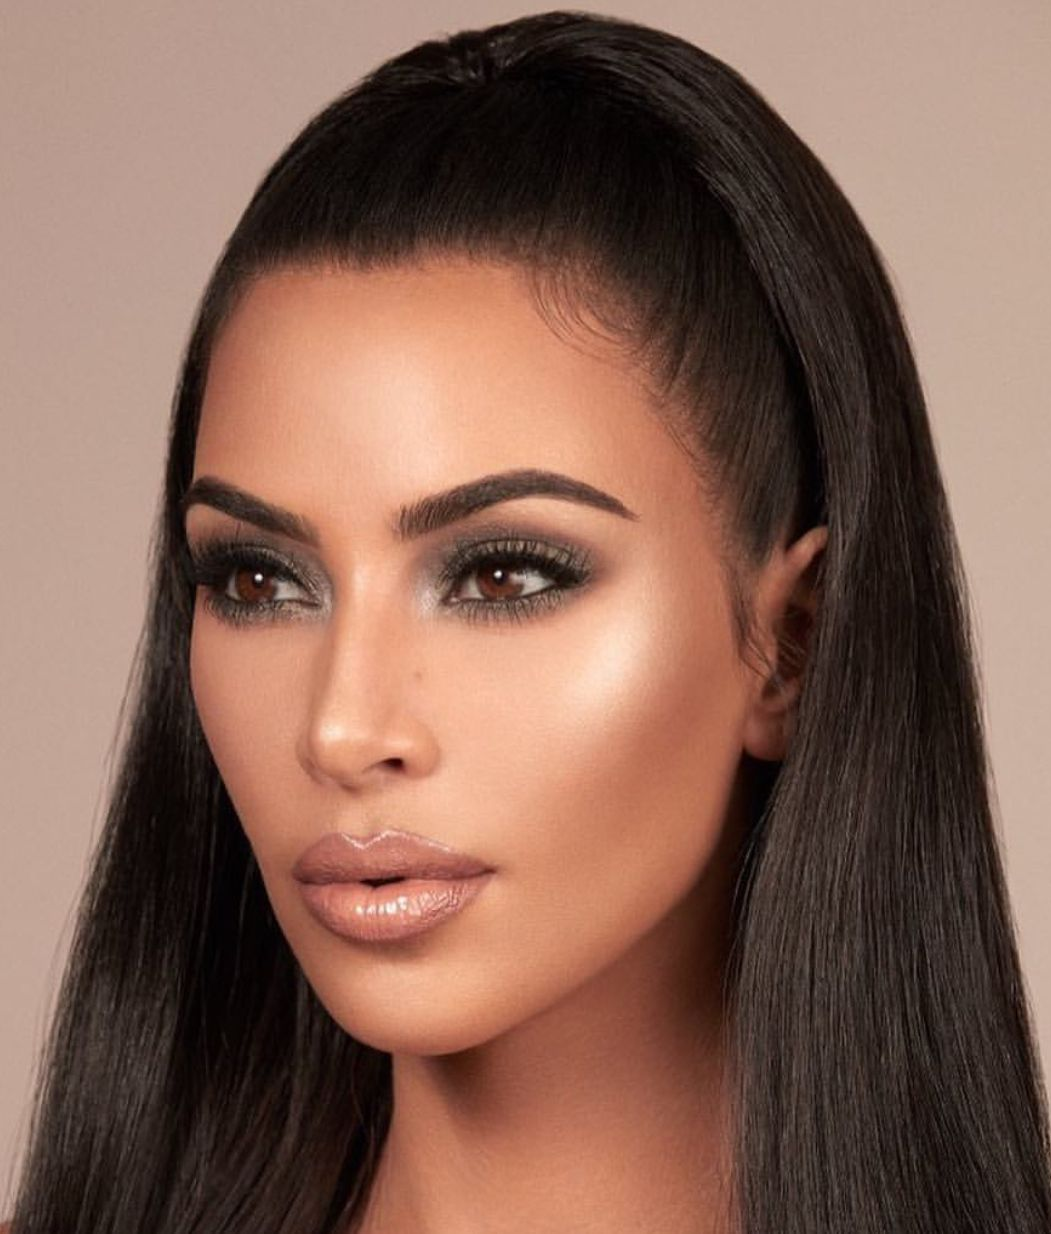 Kim kardashian KKW Beauty makeup look Kim kardashian